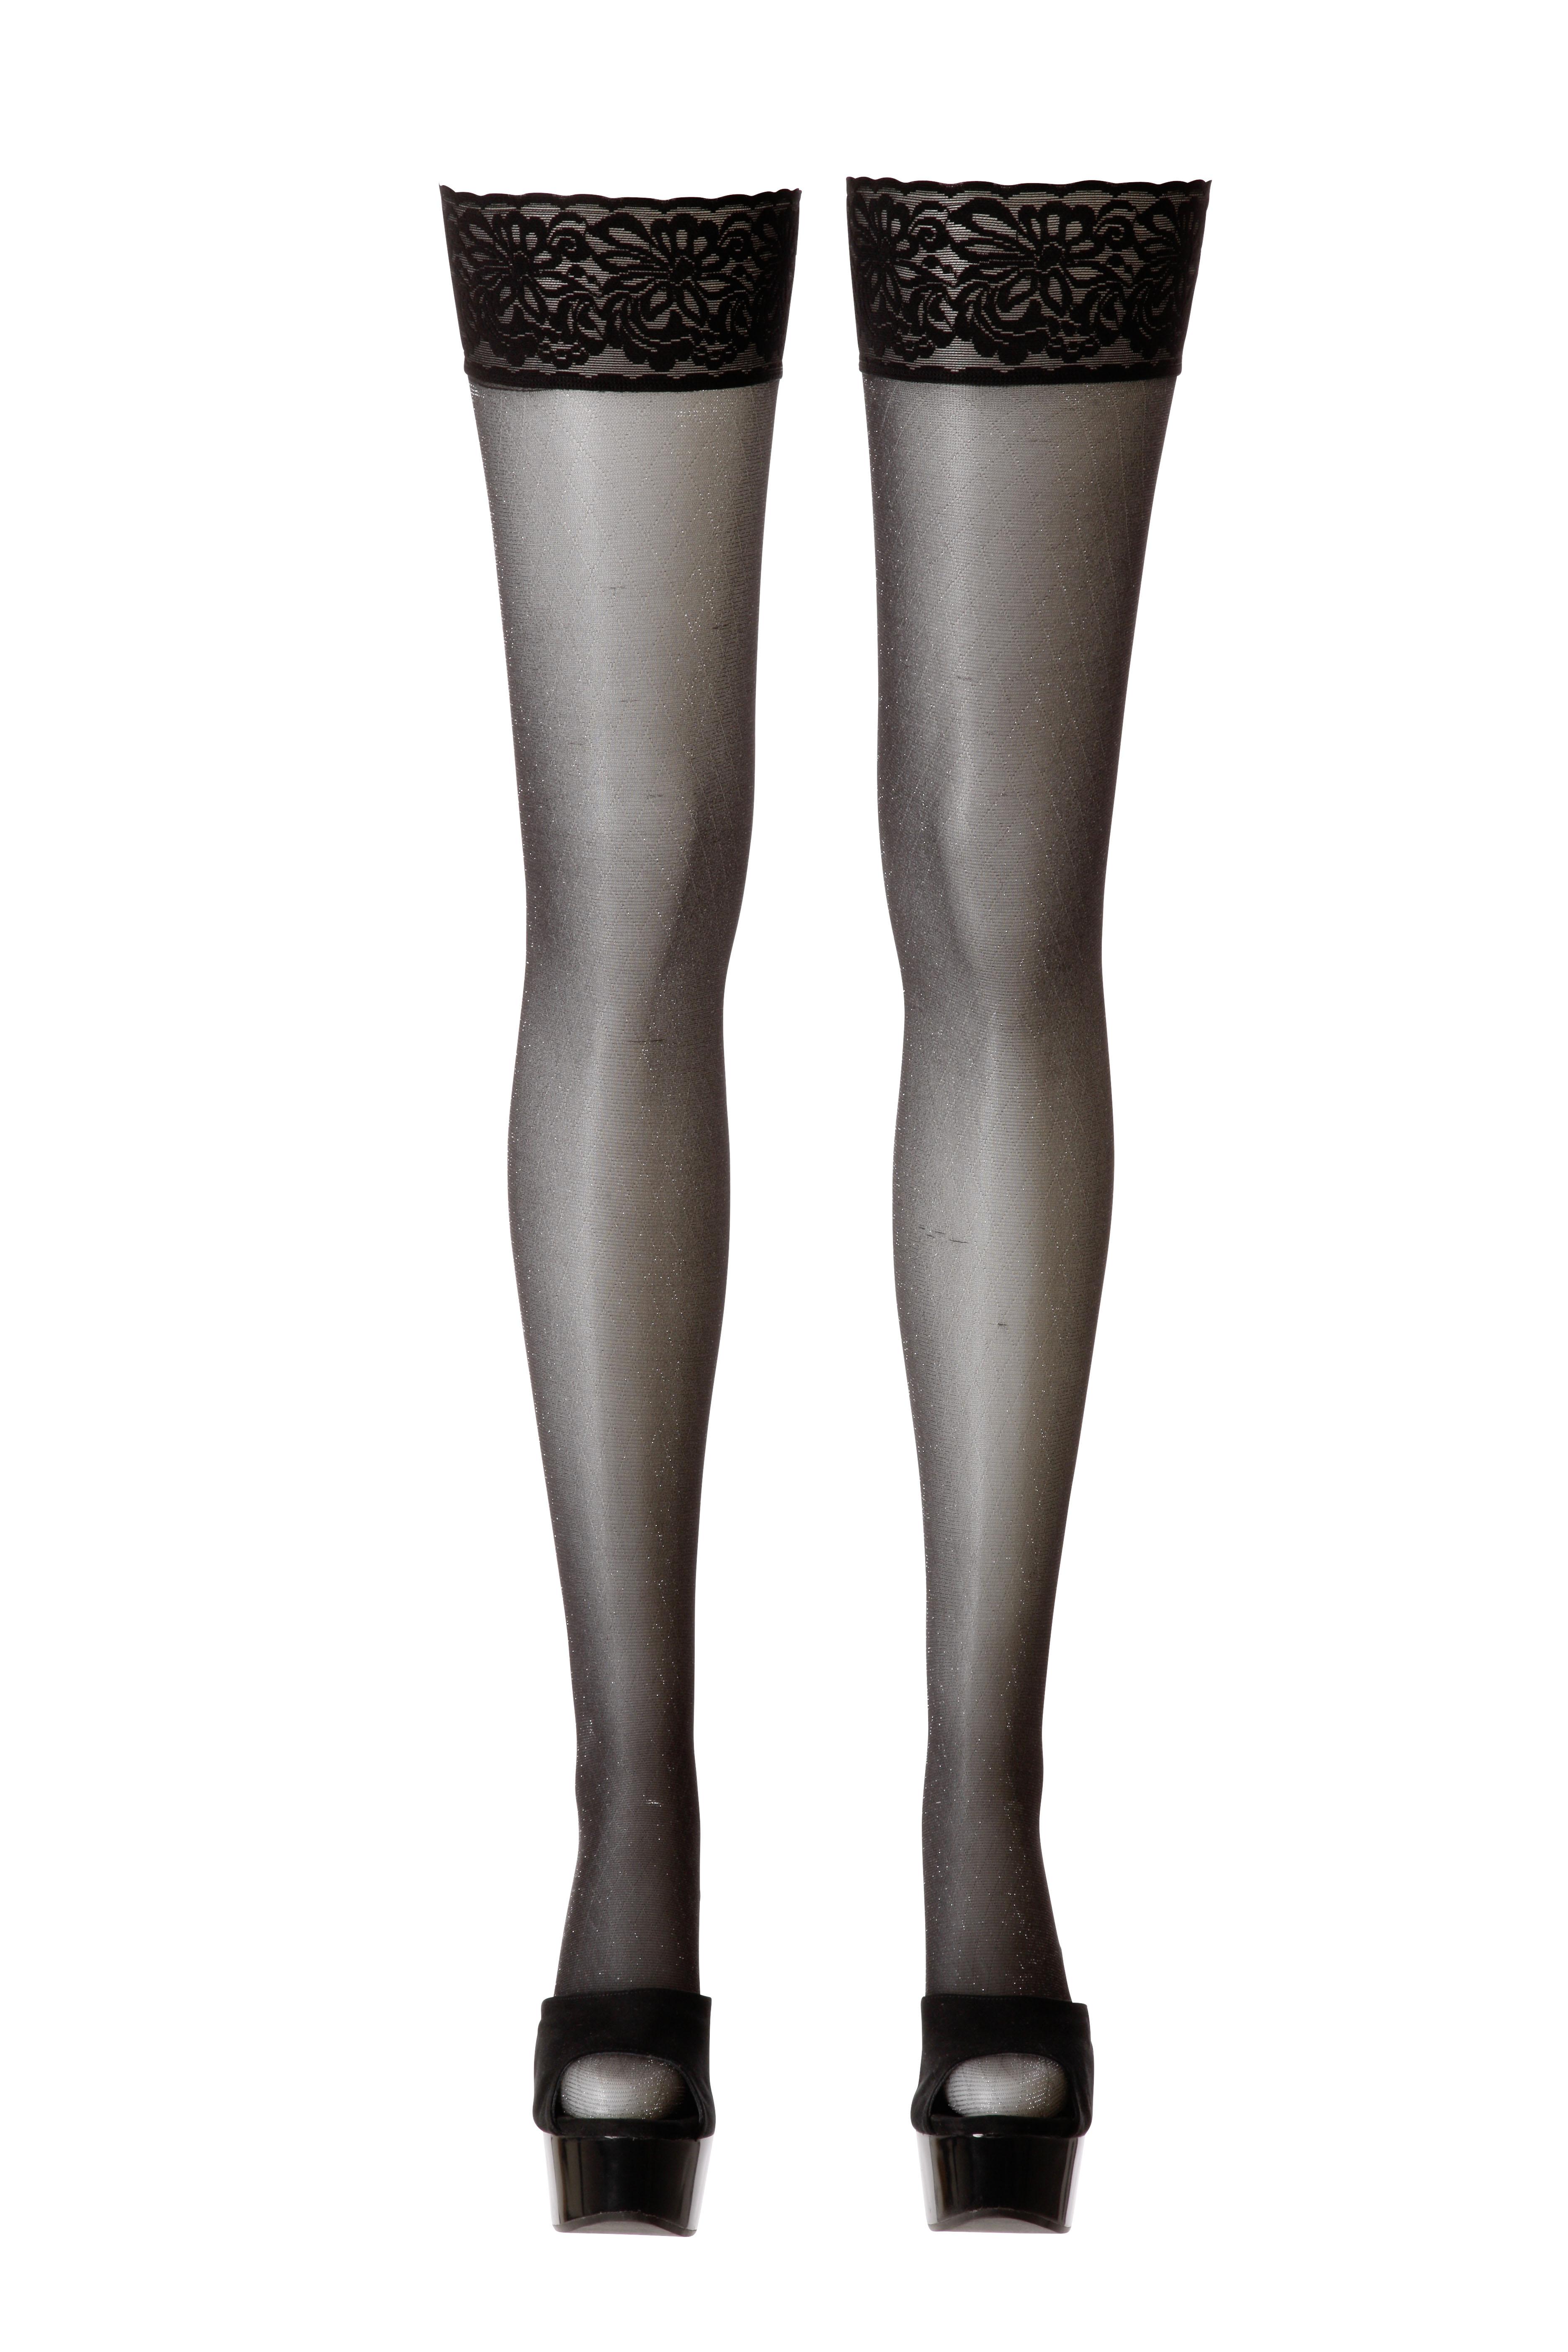 Hold-up Stockings | LINGERIE & KLÄDER, SEXIGA UNDERKLÄDER, Strumpor & Höfthållare, Brands, Cottelli Collection | Intimast.se - Sexleksaker